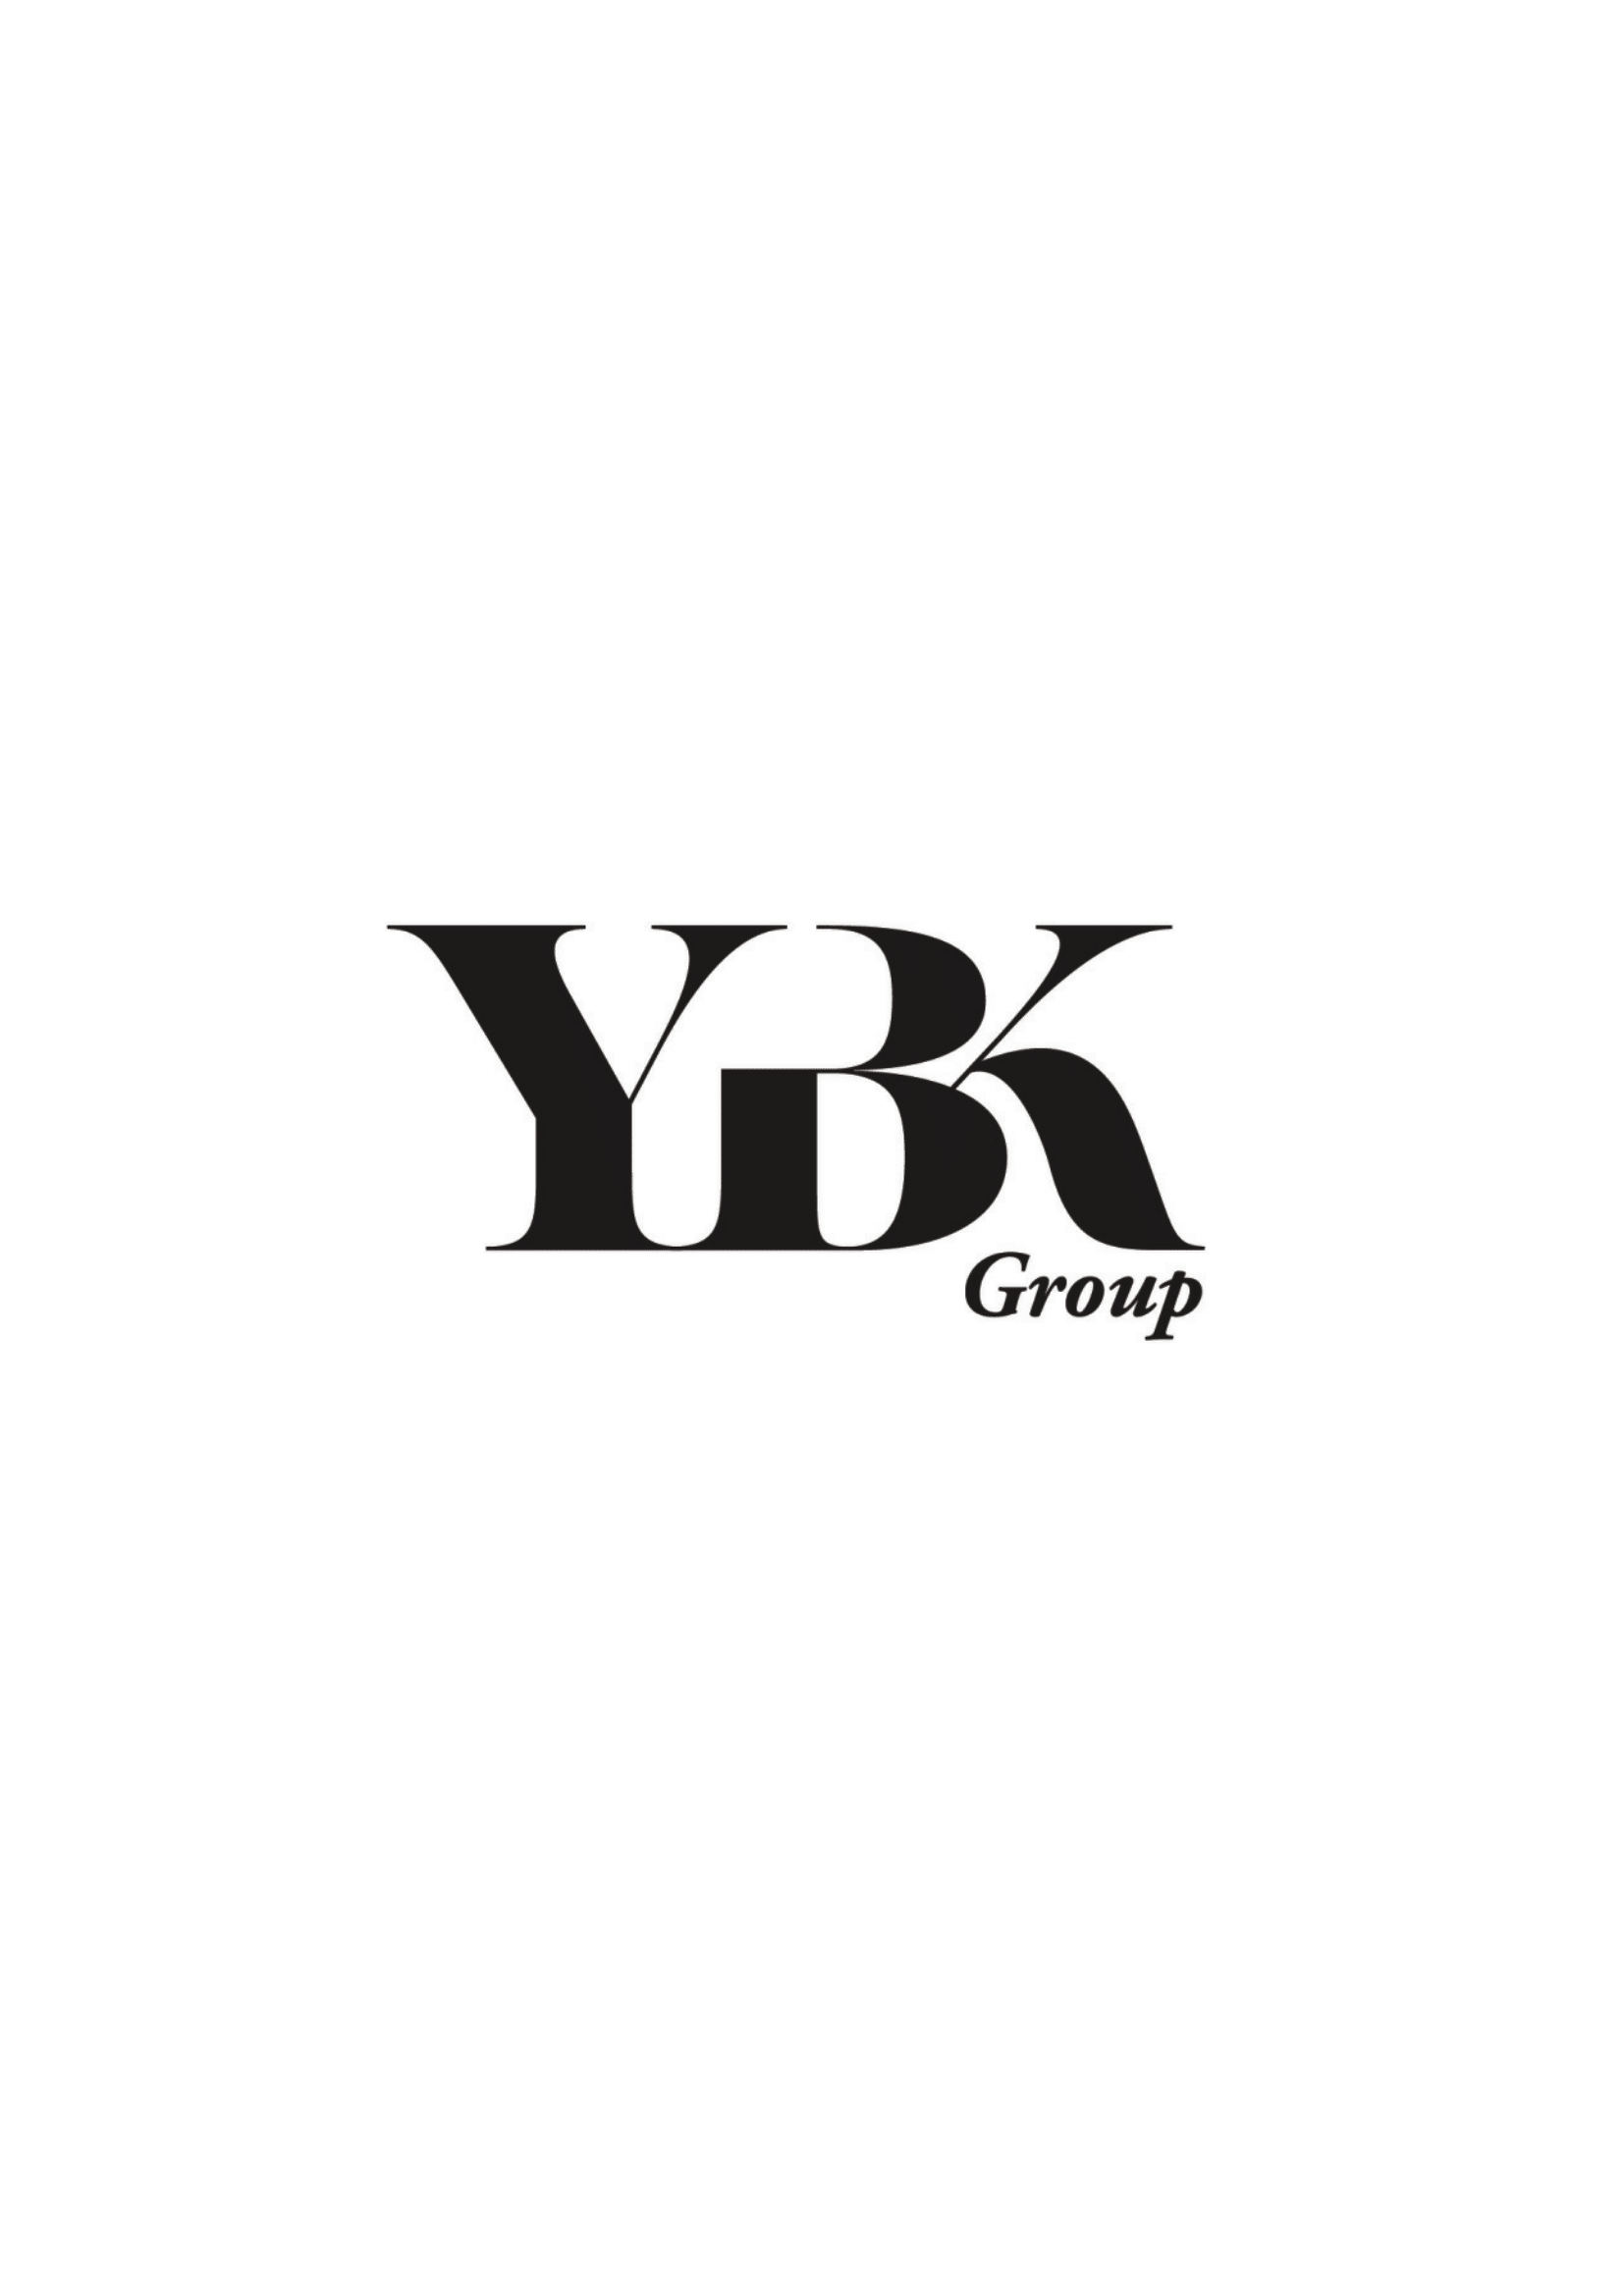 YBK GROUP